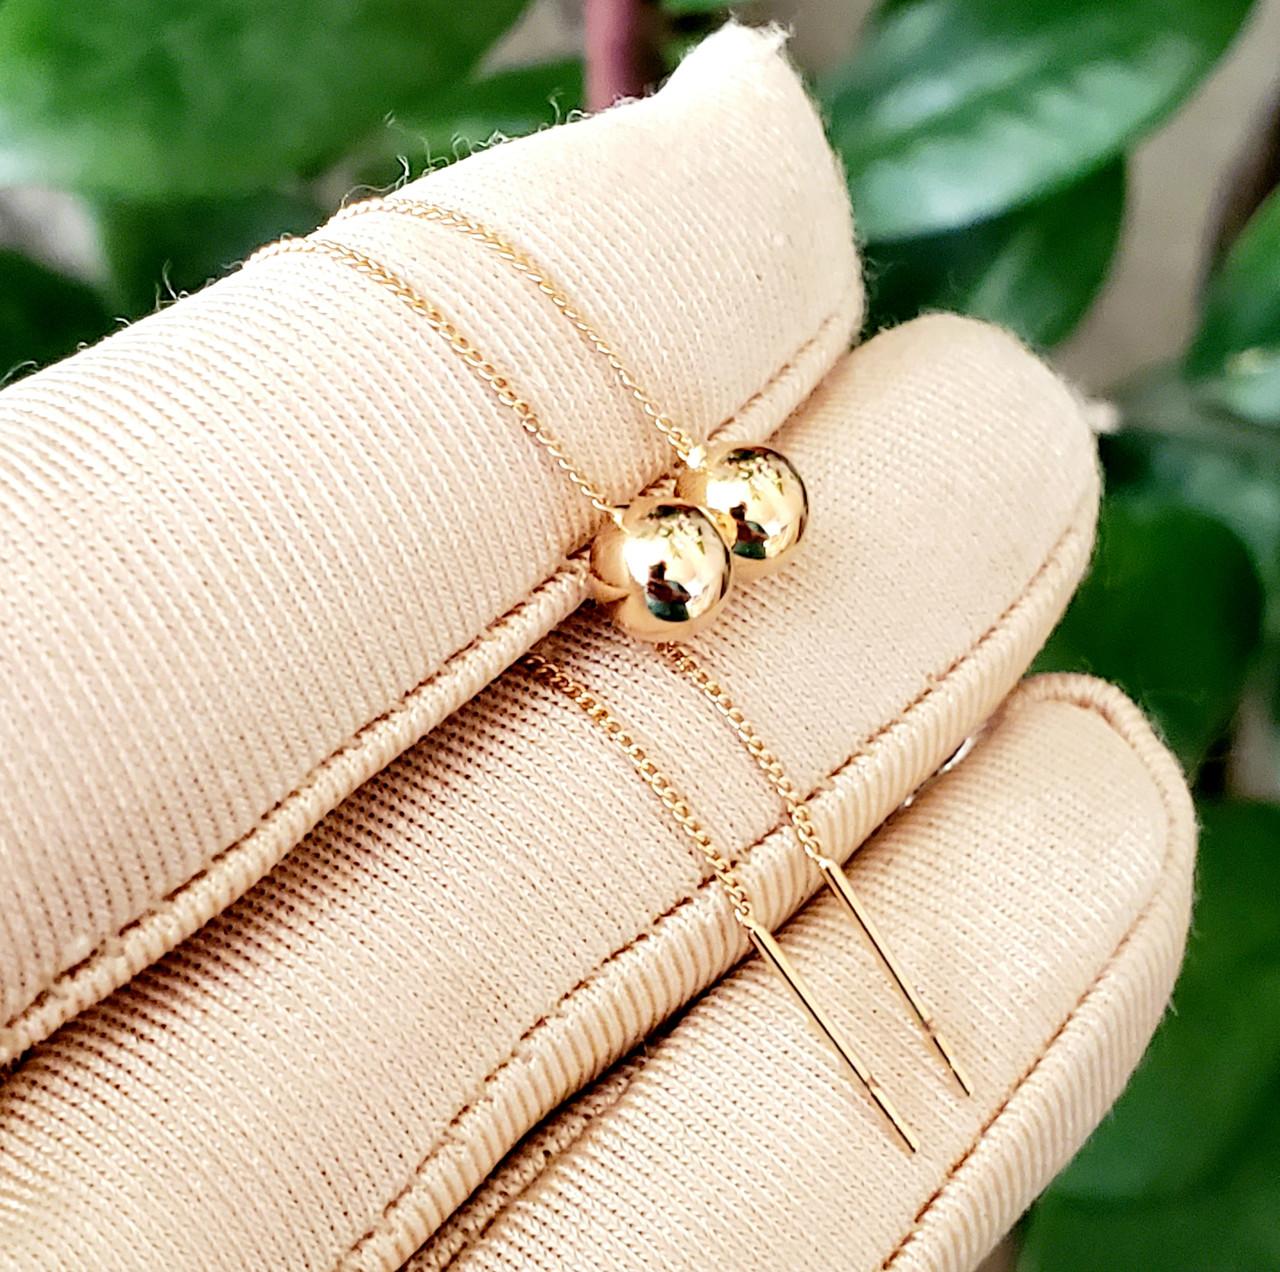 Серьги-протяжи с шариками 6мм Xuping длина 8.5см медицинское золото позолота 18К с836